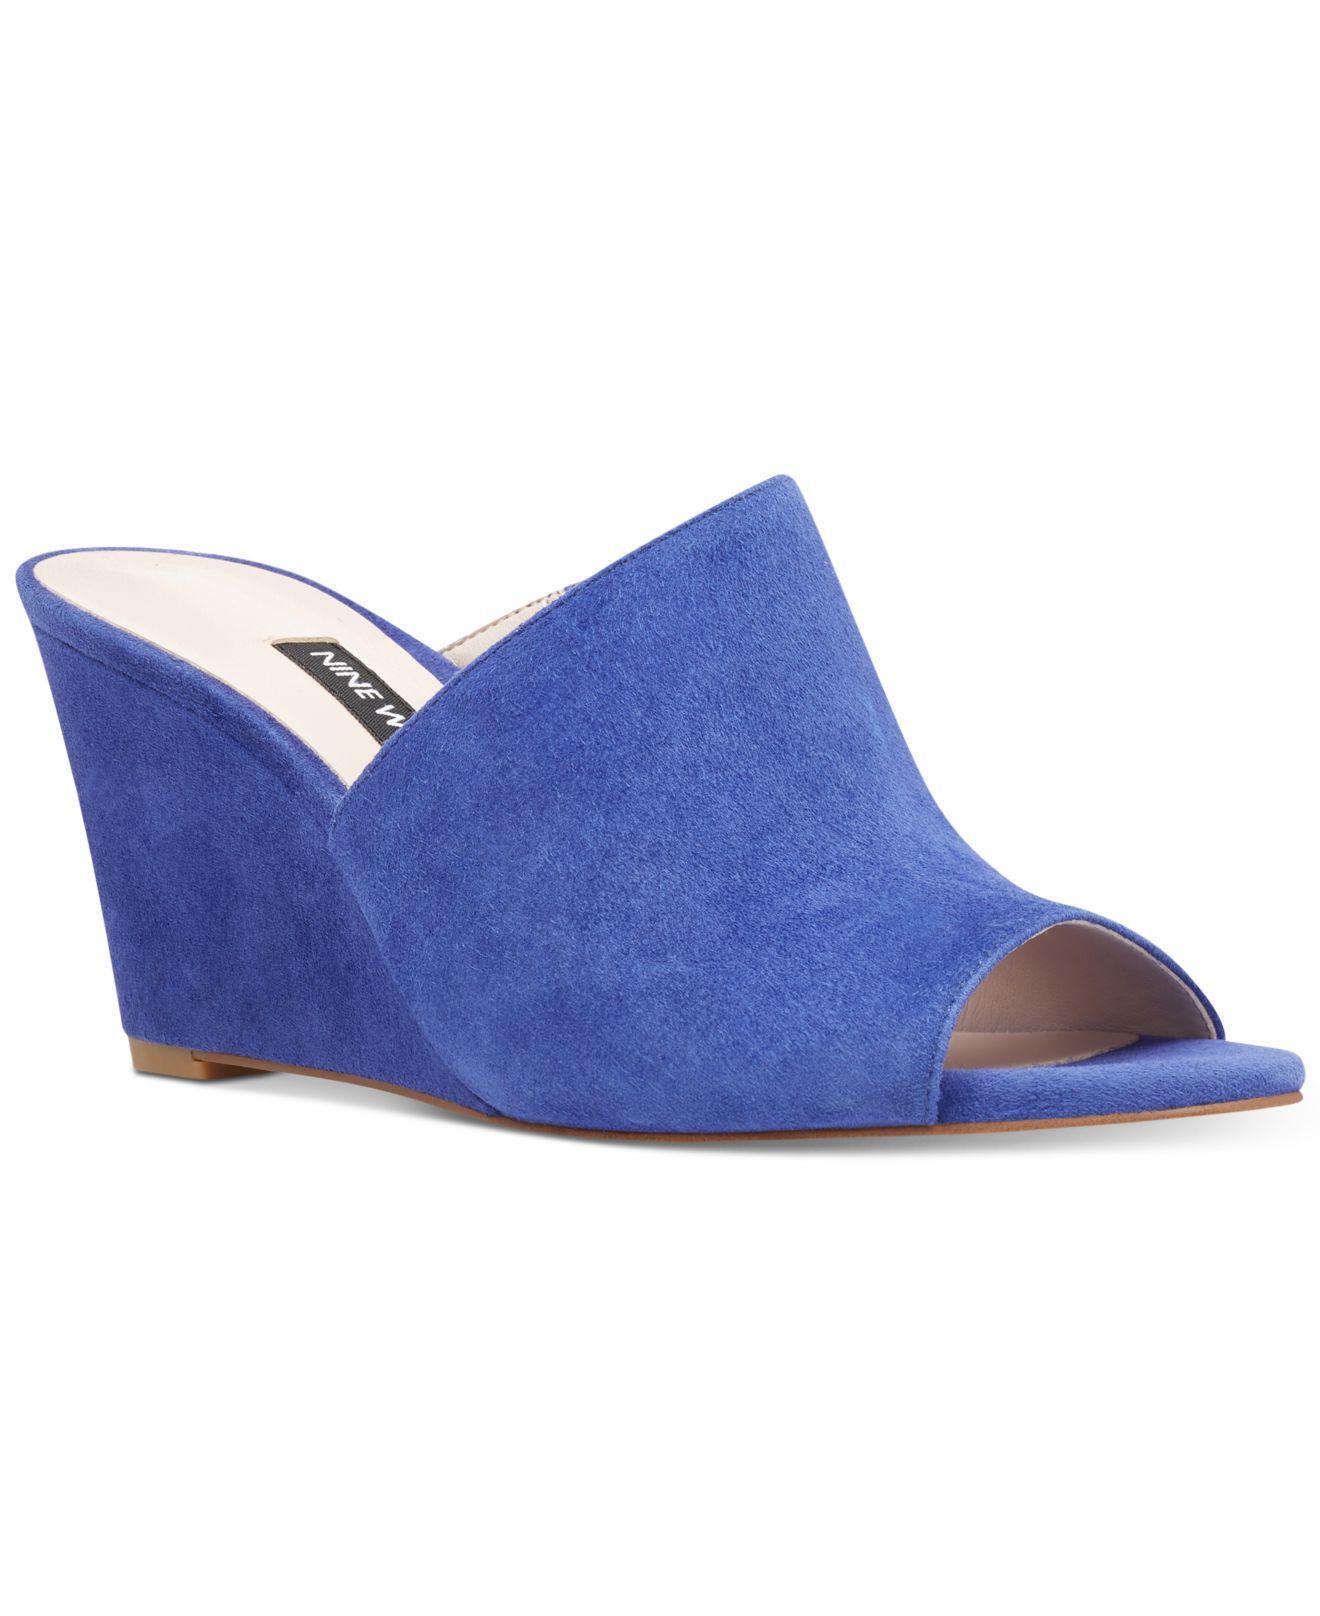 Nine West Janissah Slip-On Wedge Sandals Women's Shoes N2bQBMsy